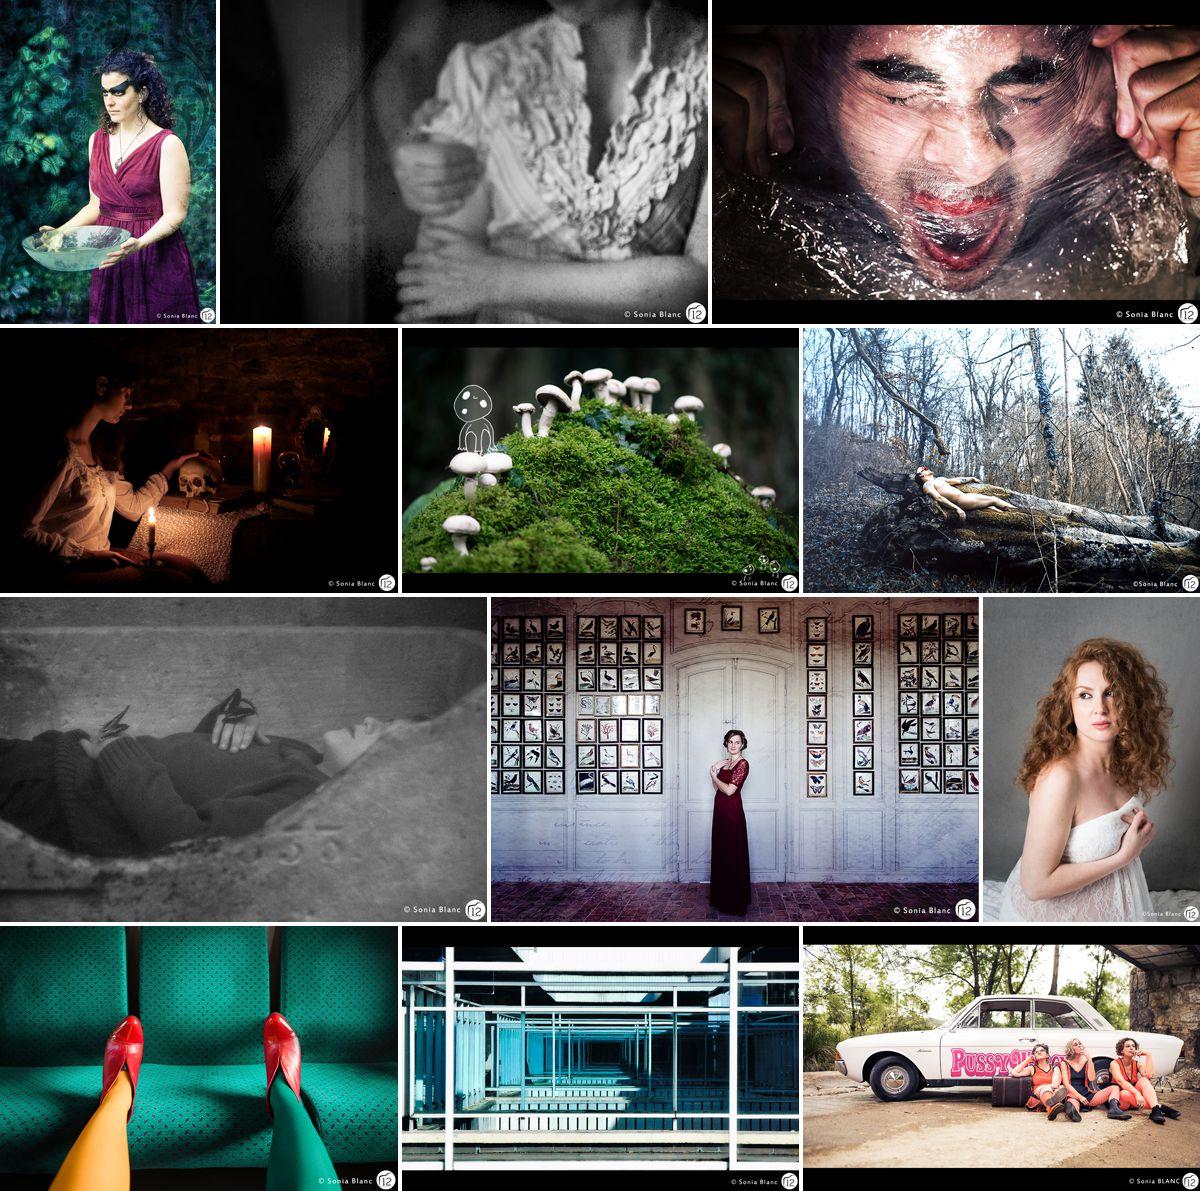 projet photo personnel annuel - 12 photographes s'inspirent